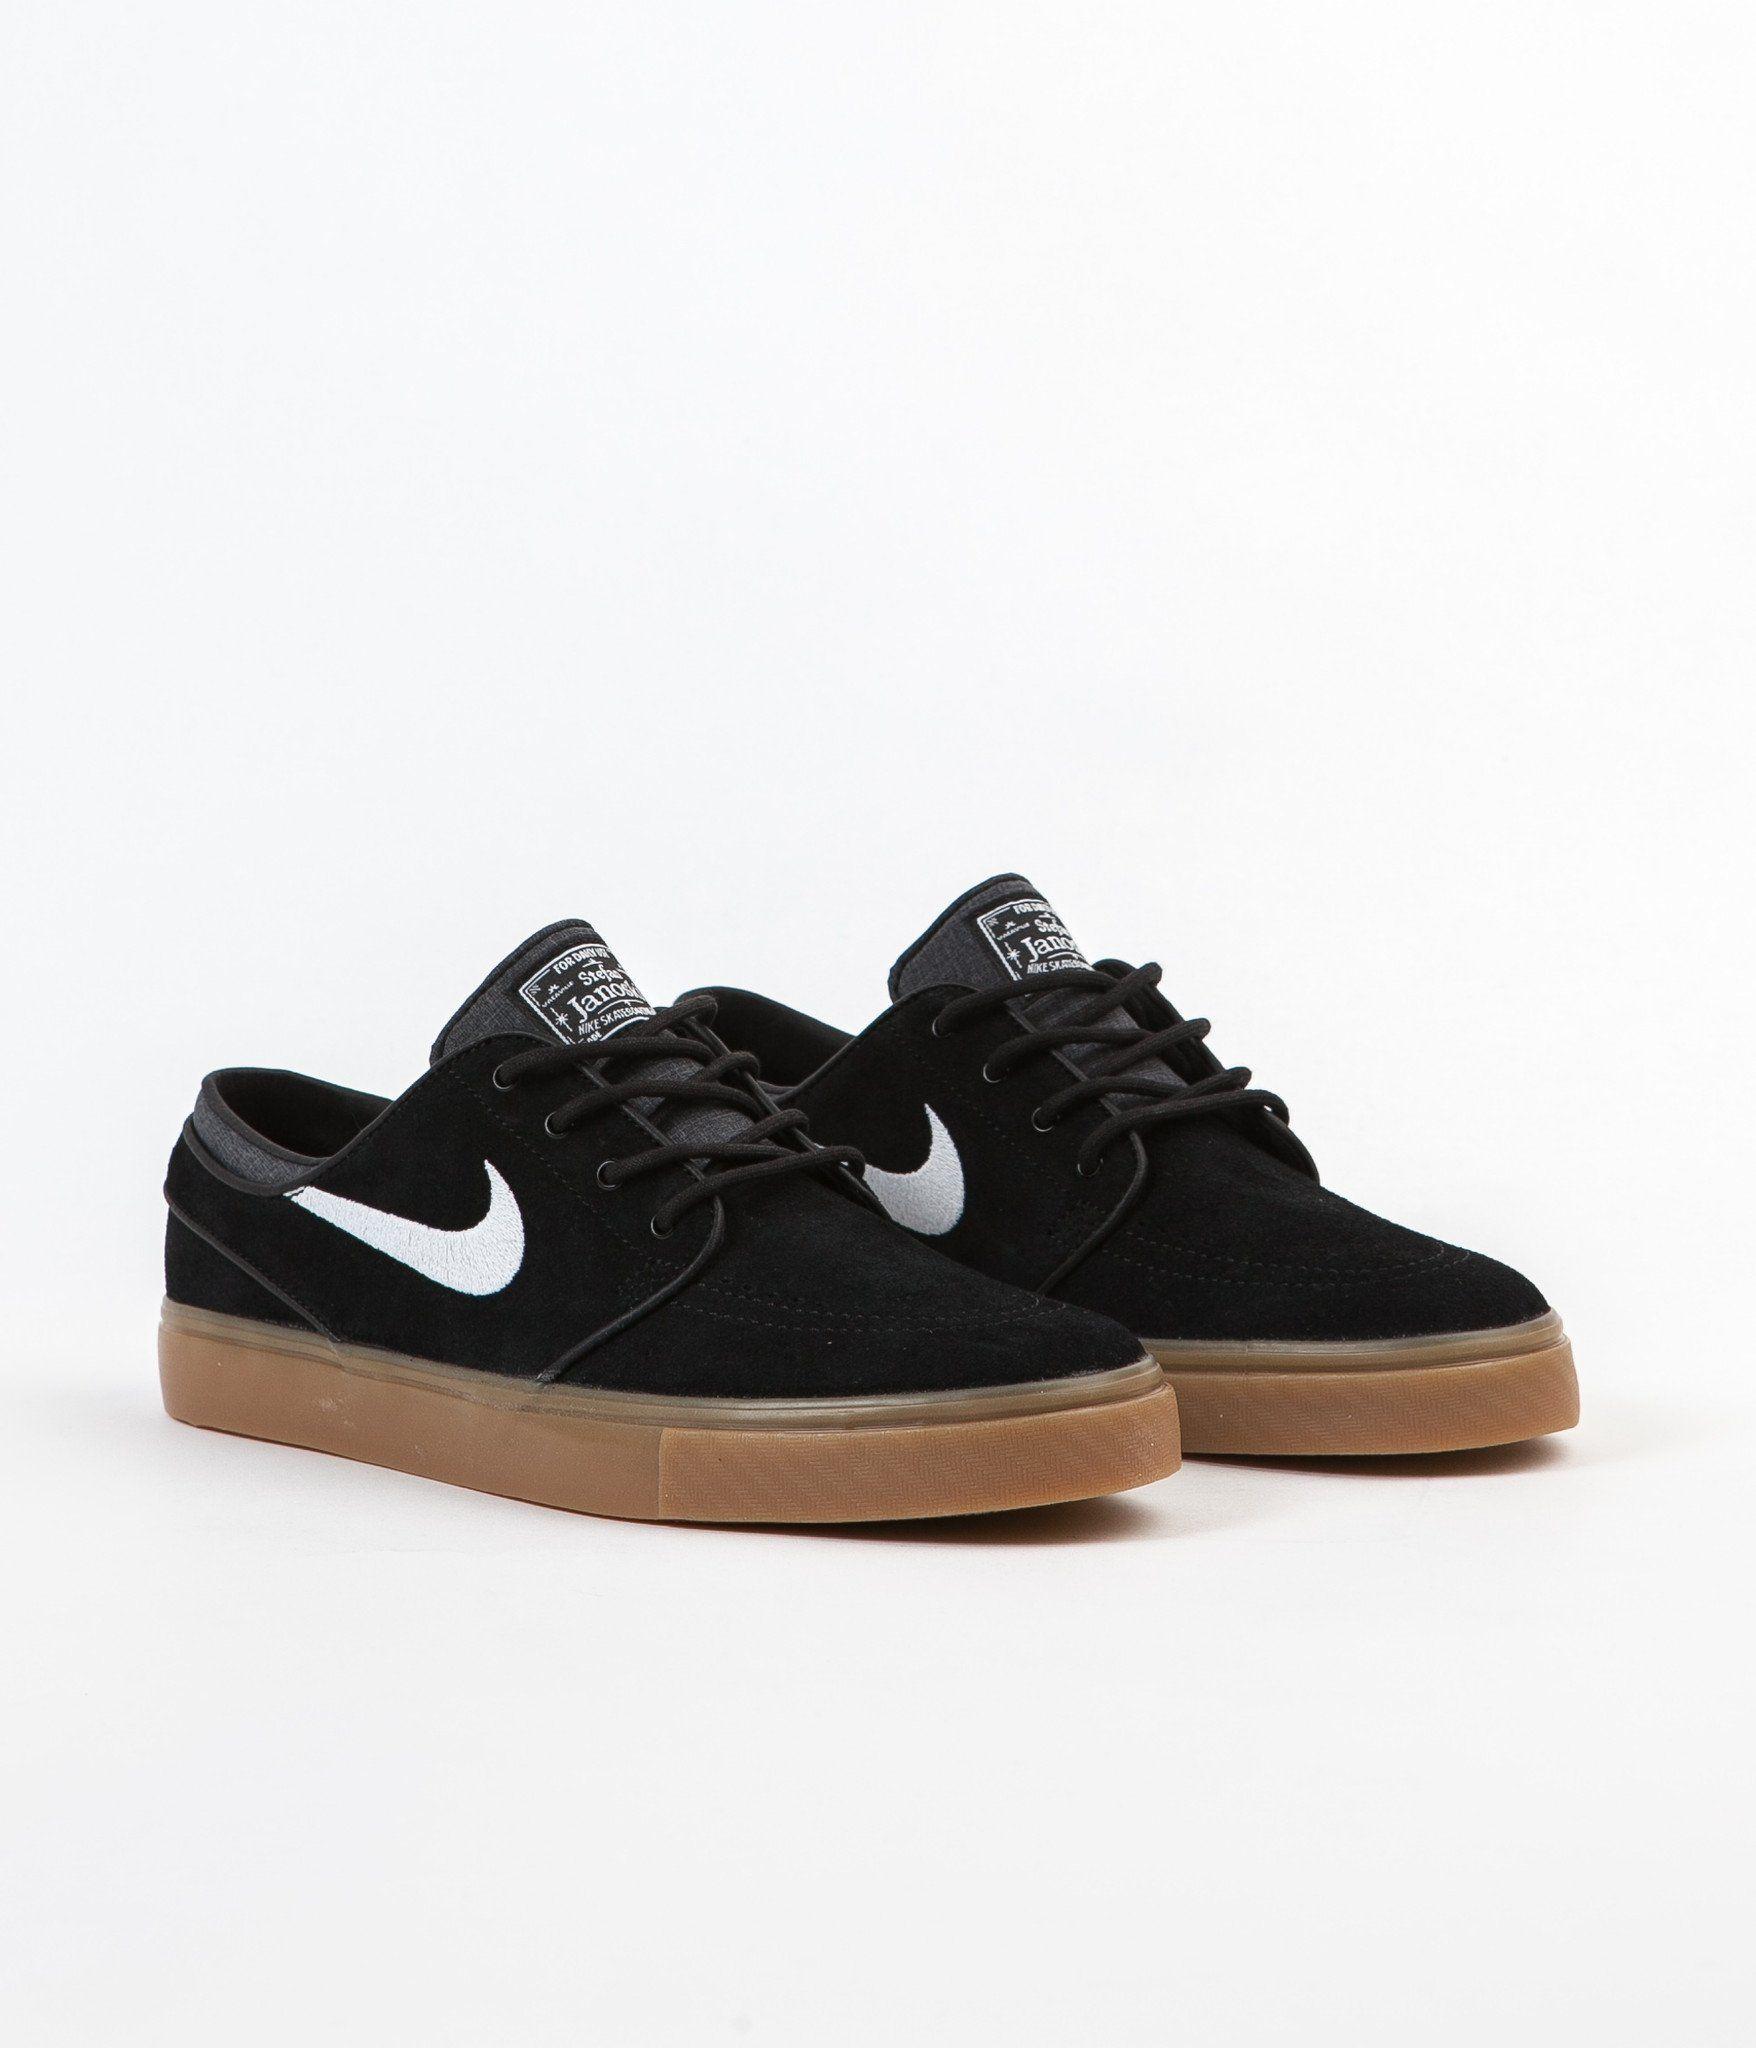 Nike Sb Stefan Janoski Shoes Black White Gum Light Brown Nike Preto Tenis